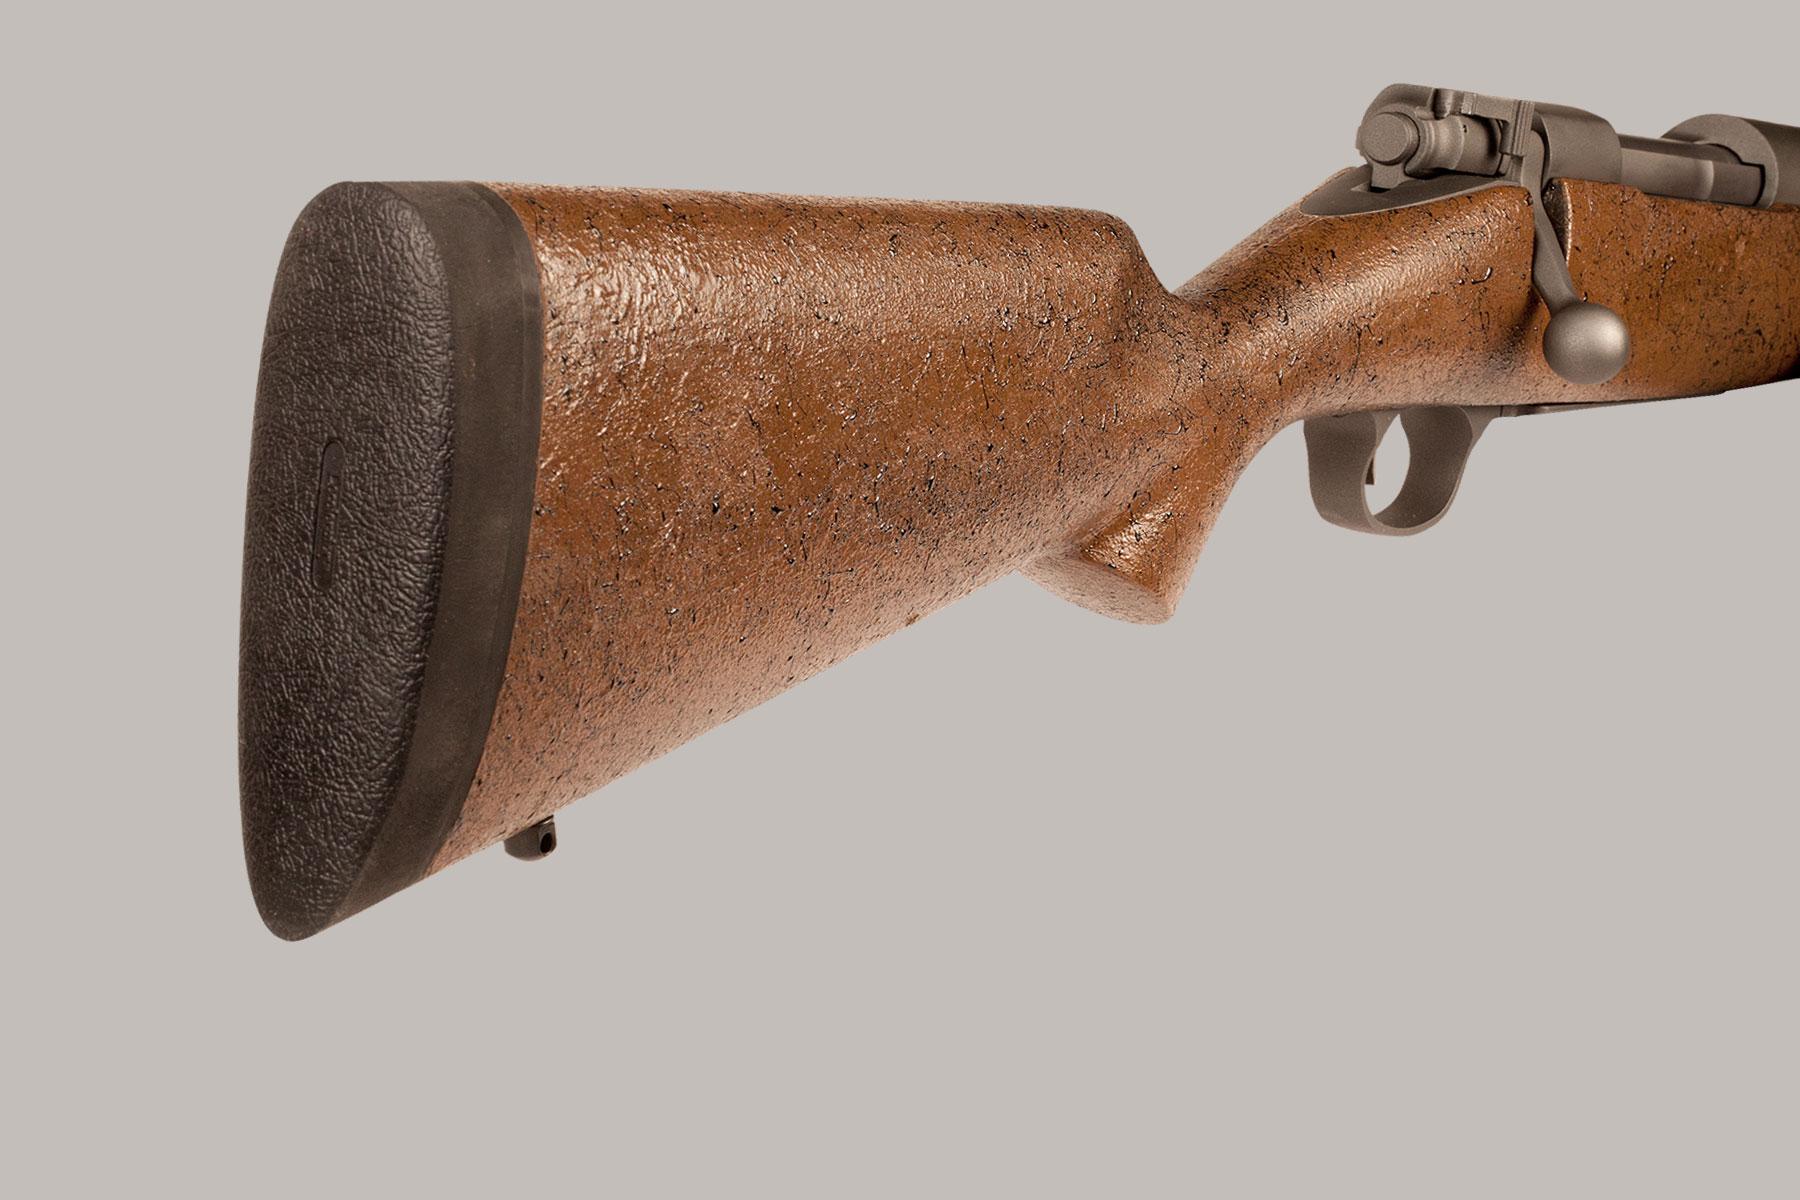 montana-rifle-04.jpg